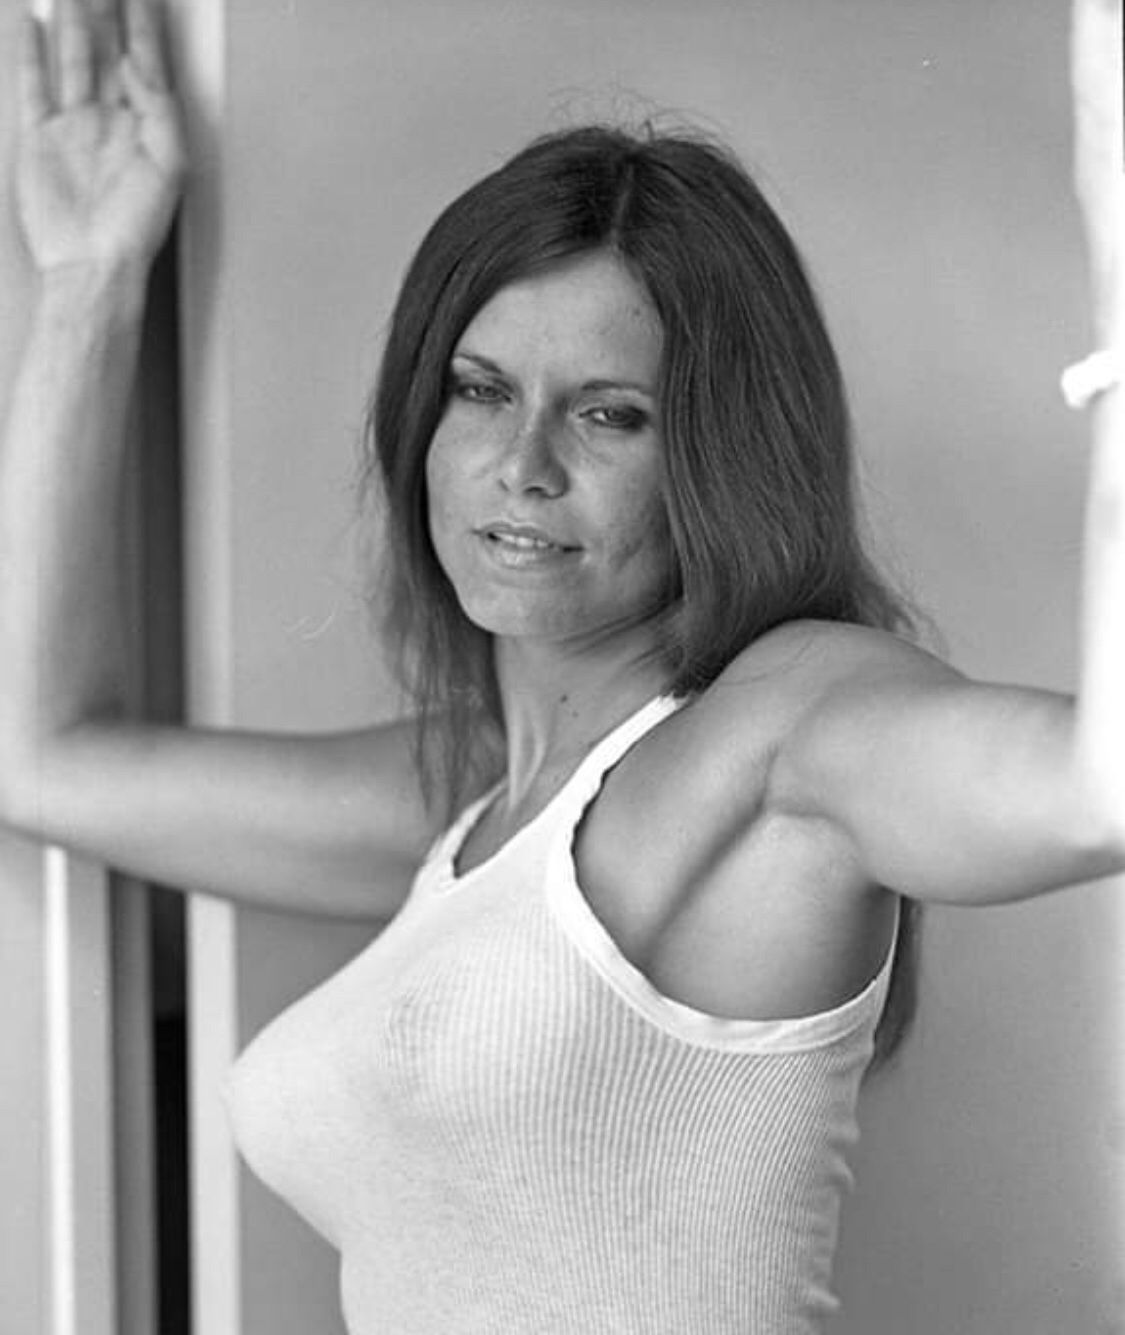 Linda Vaughn Nude Photo Gallery